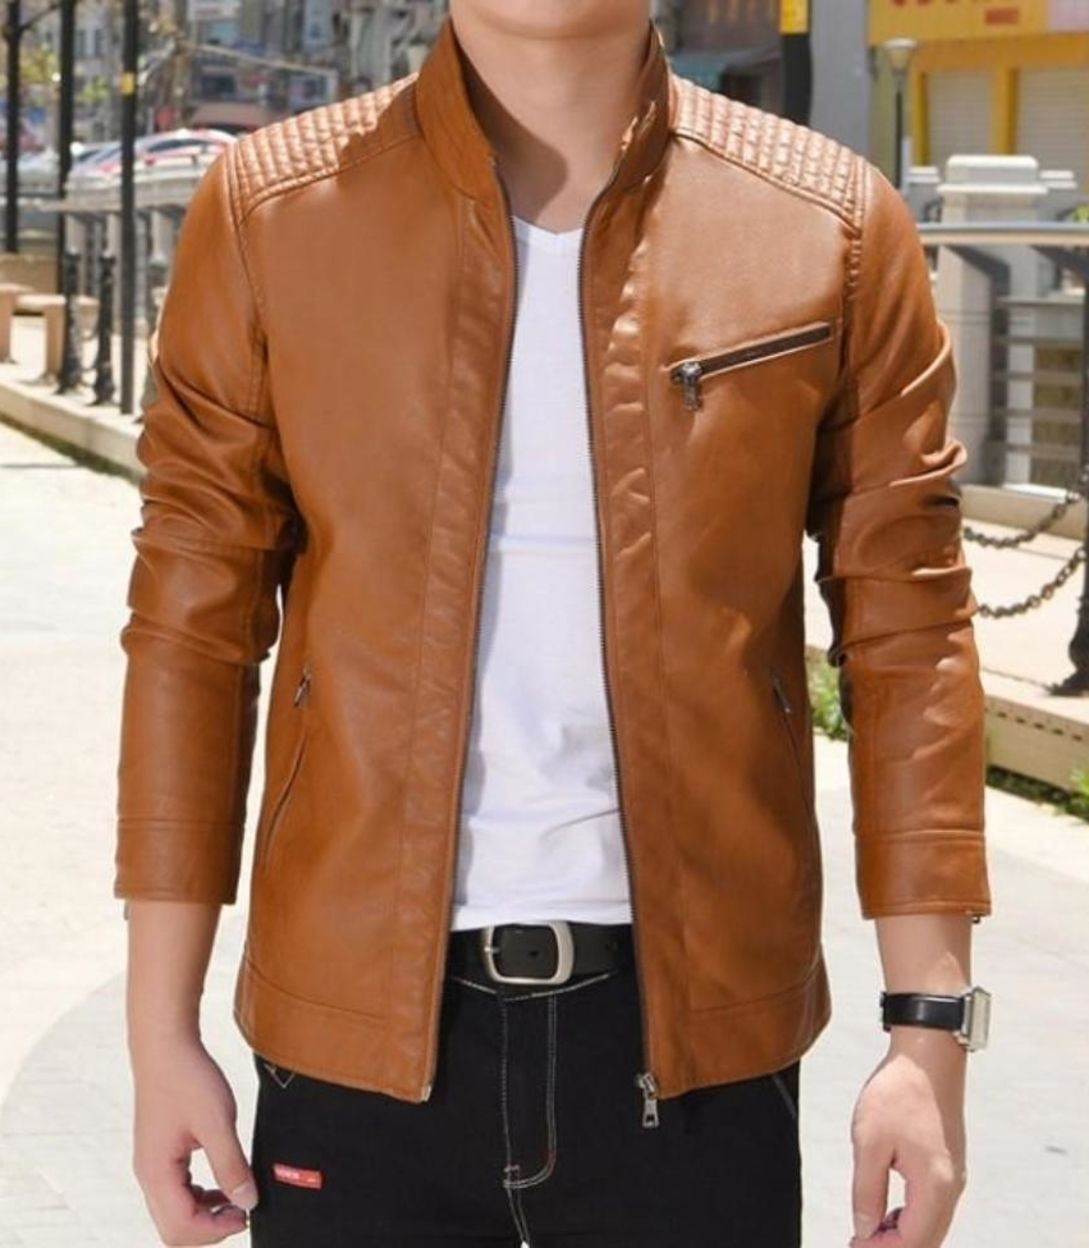 Mens Faux Leather Biker Jacket Jaket Kulit Jaket Kulit [ 1248 x 1089 Pixel ]